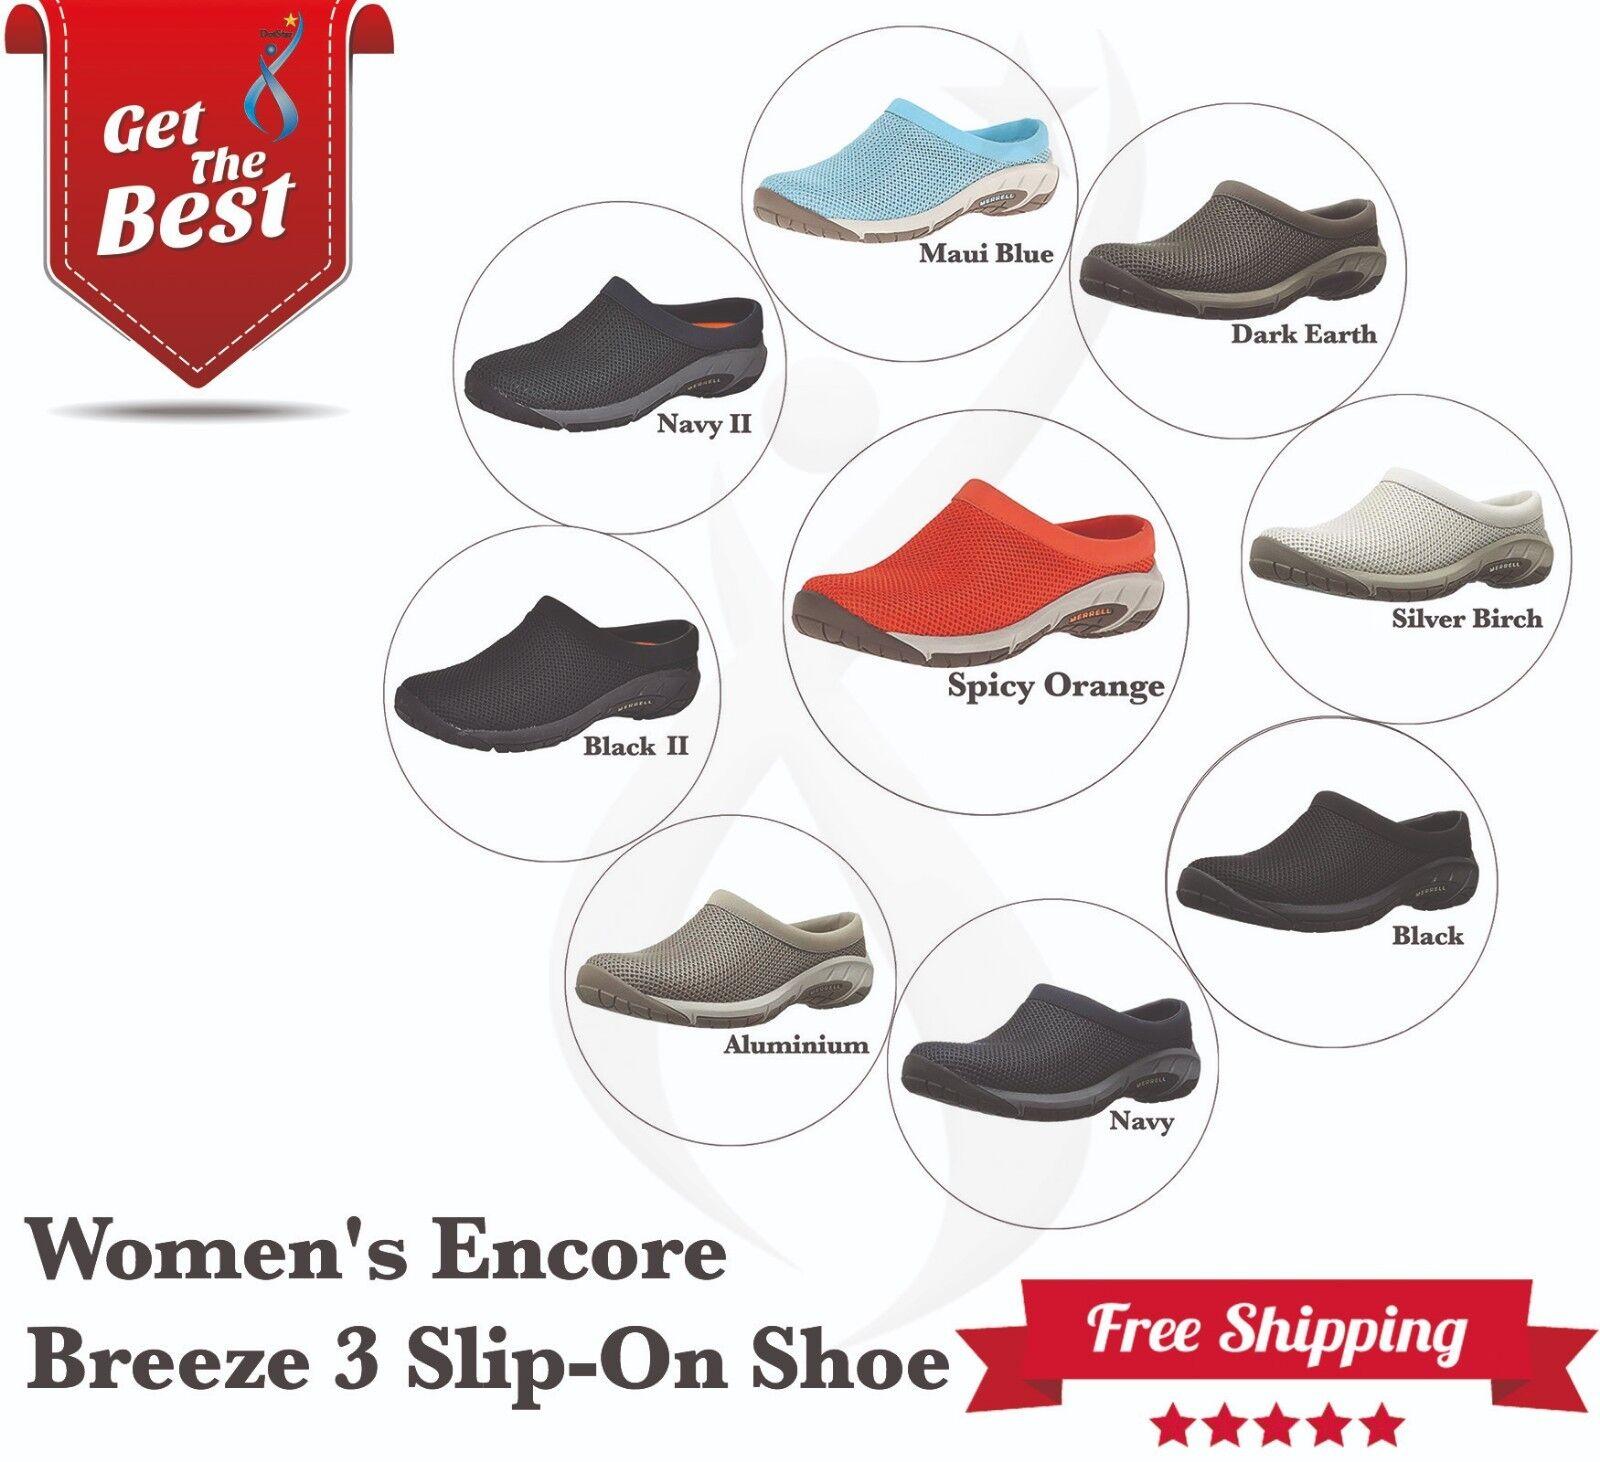 MERRELL Chaussures Femmes Encore Breeze 3 Slip-On chaussures